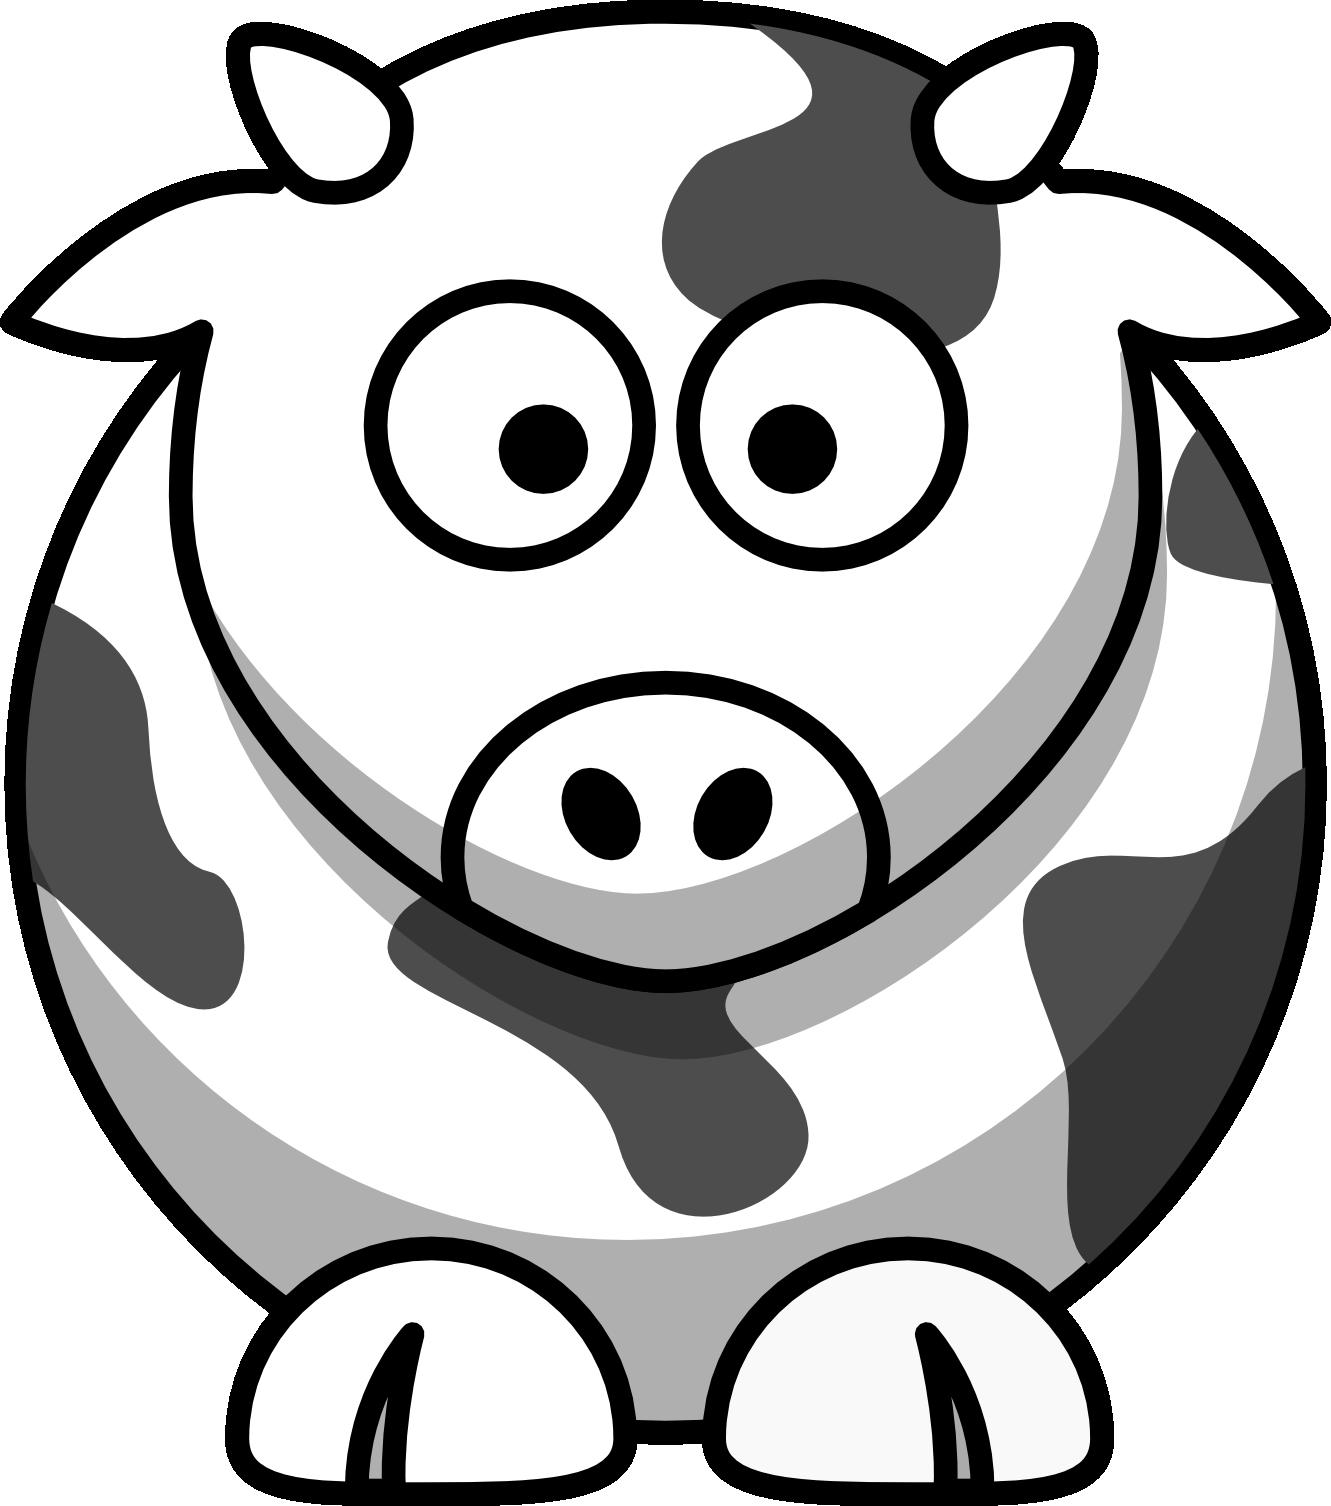 Clipart rat head cartoon. Free black and white